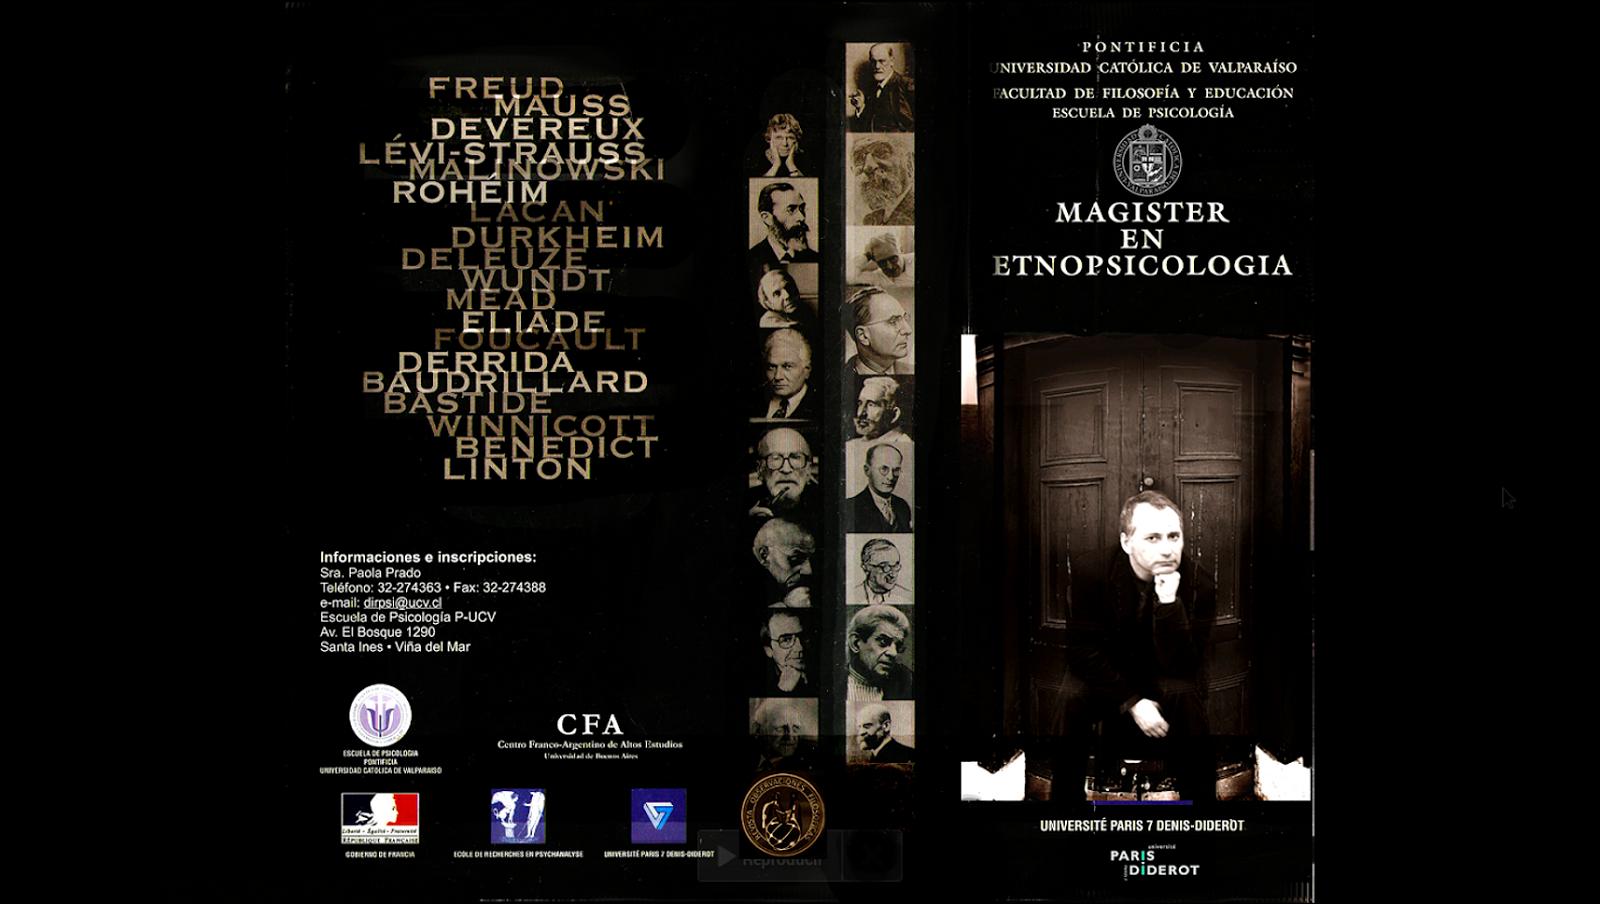 http://2.bp.blogspot.com/-fRrzrt_pvPg/U8IT5dM2kCI/AAAAAAAAV0w/HFLvg7vd1lE/s1600/Adolfo+Vasquez+Rocca+_+Catalogo+Postgrado+EtnoPsicologia.png